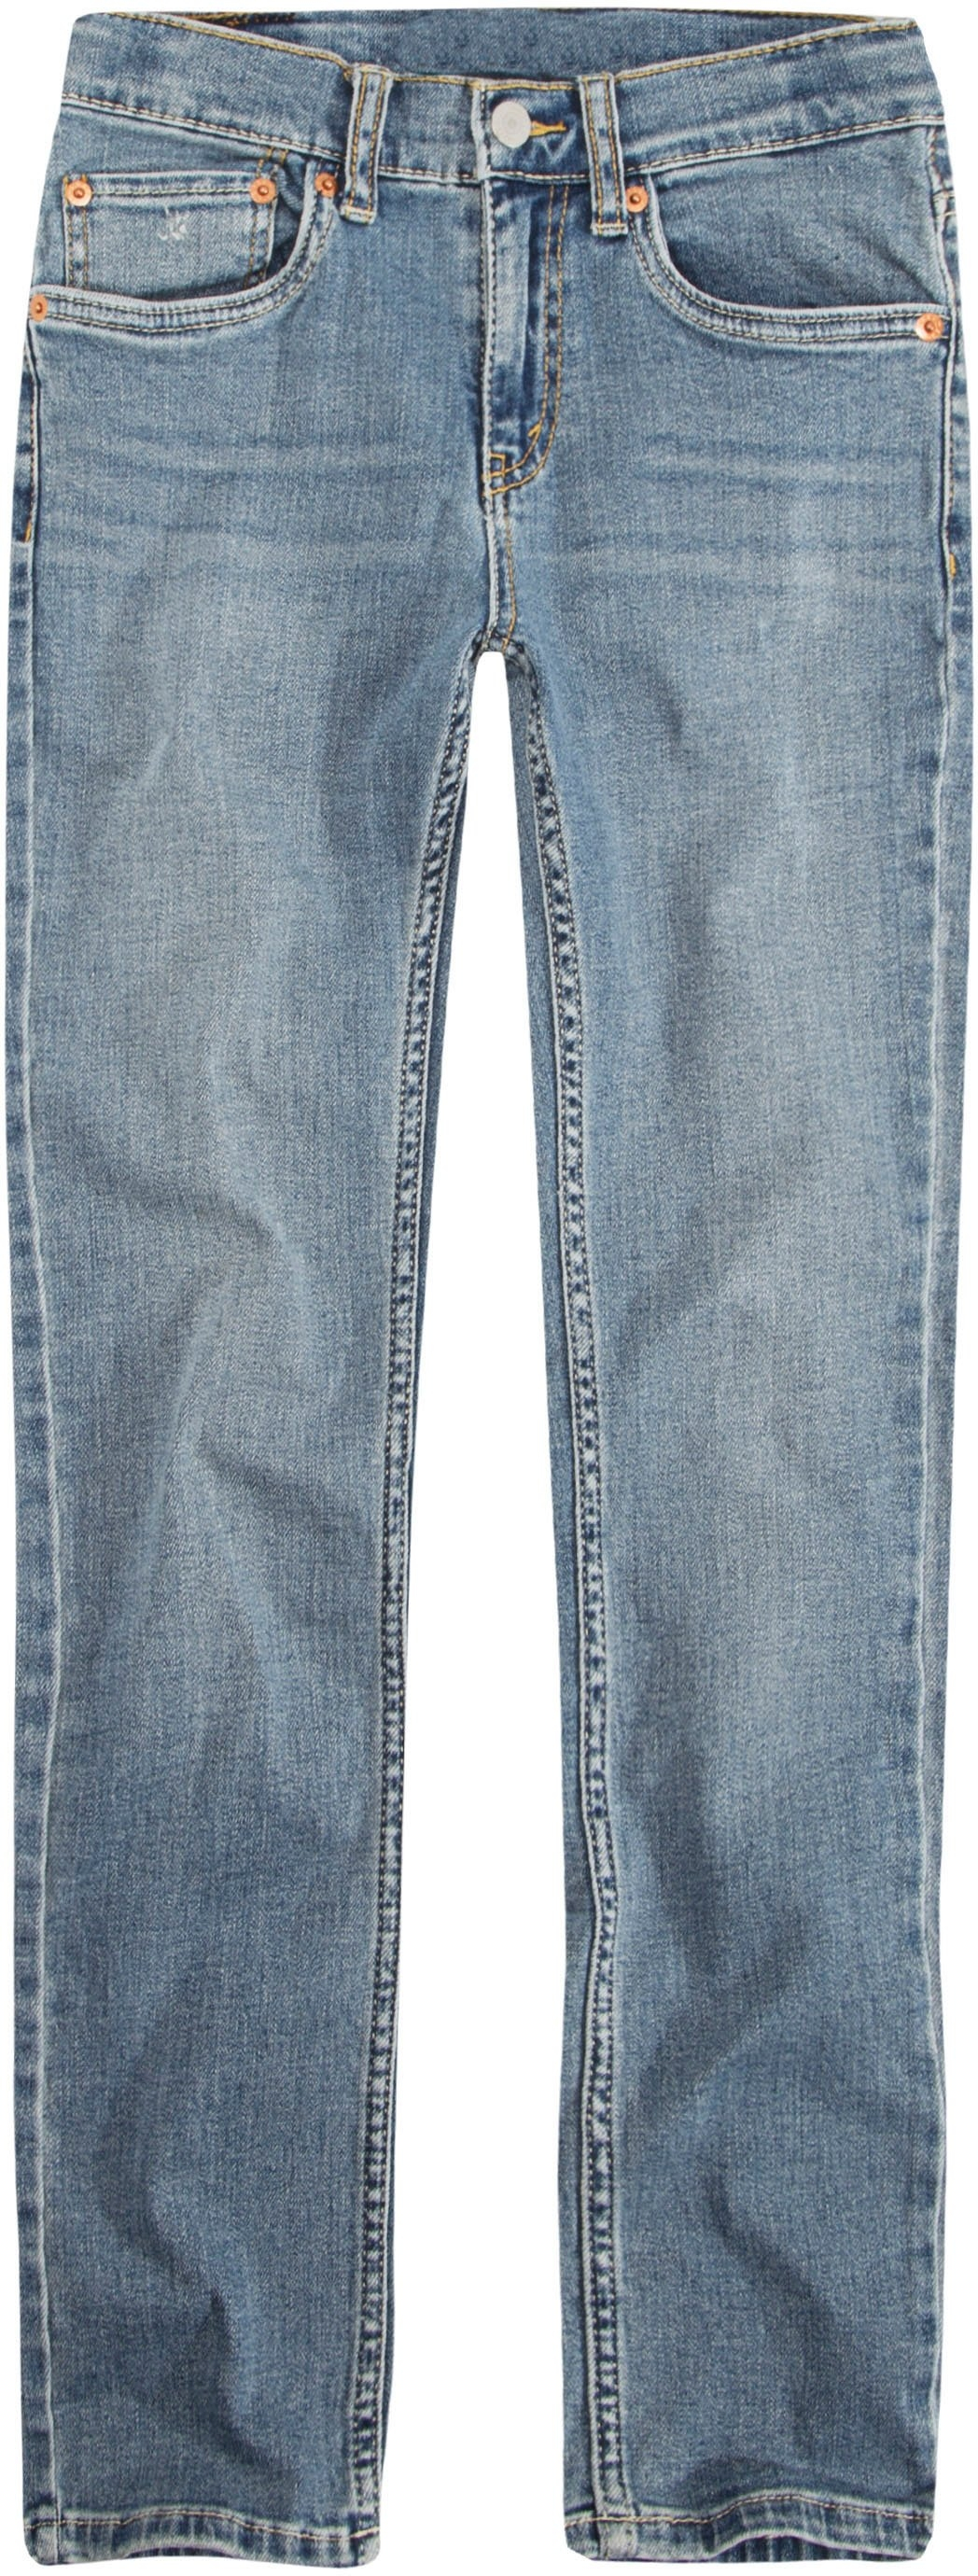 Levi's Kidswear stretch jeans »LVB 512 SLIM TAPER JEAN« - verschillende betaalmethodes